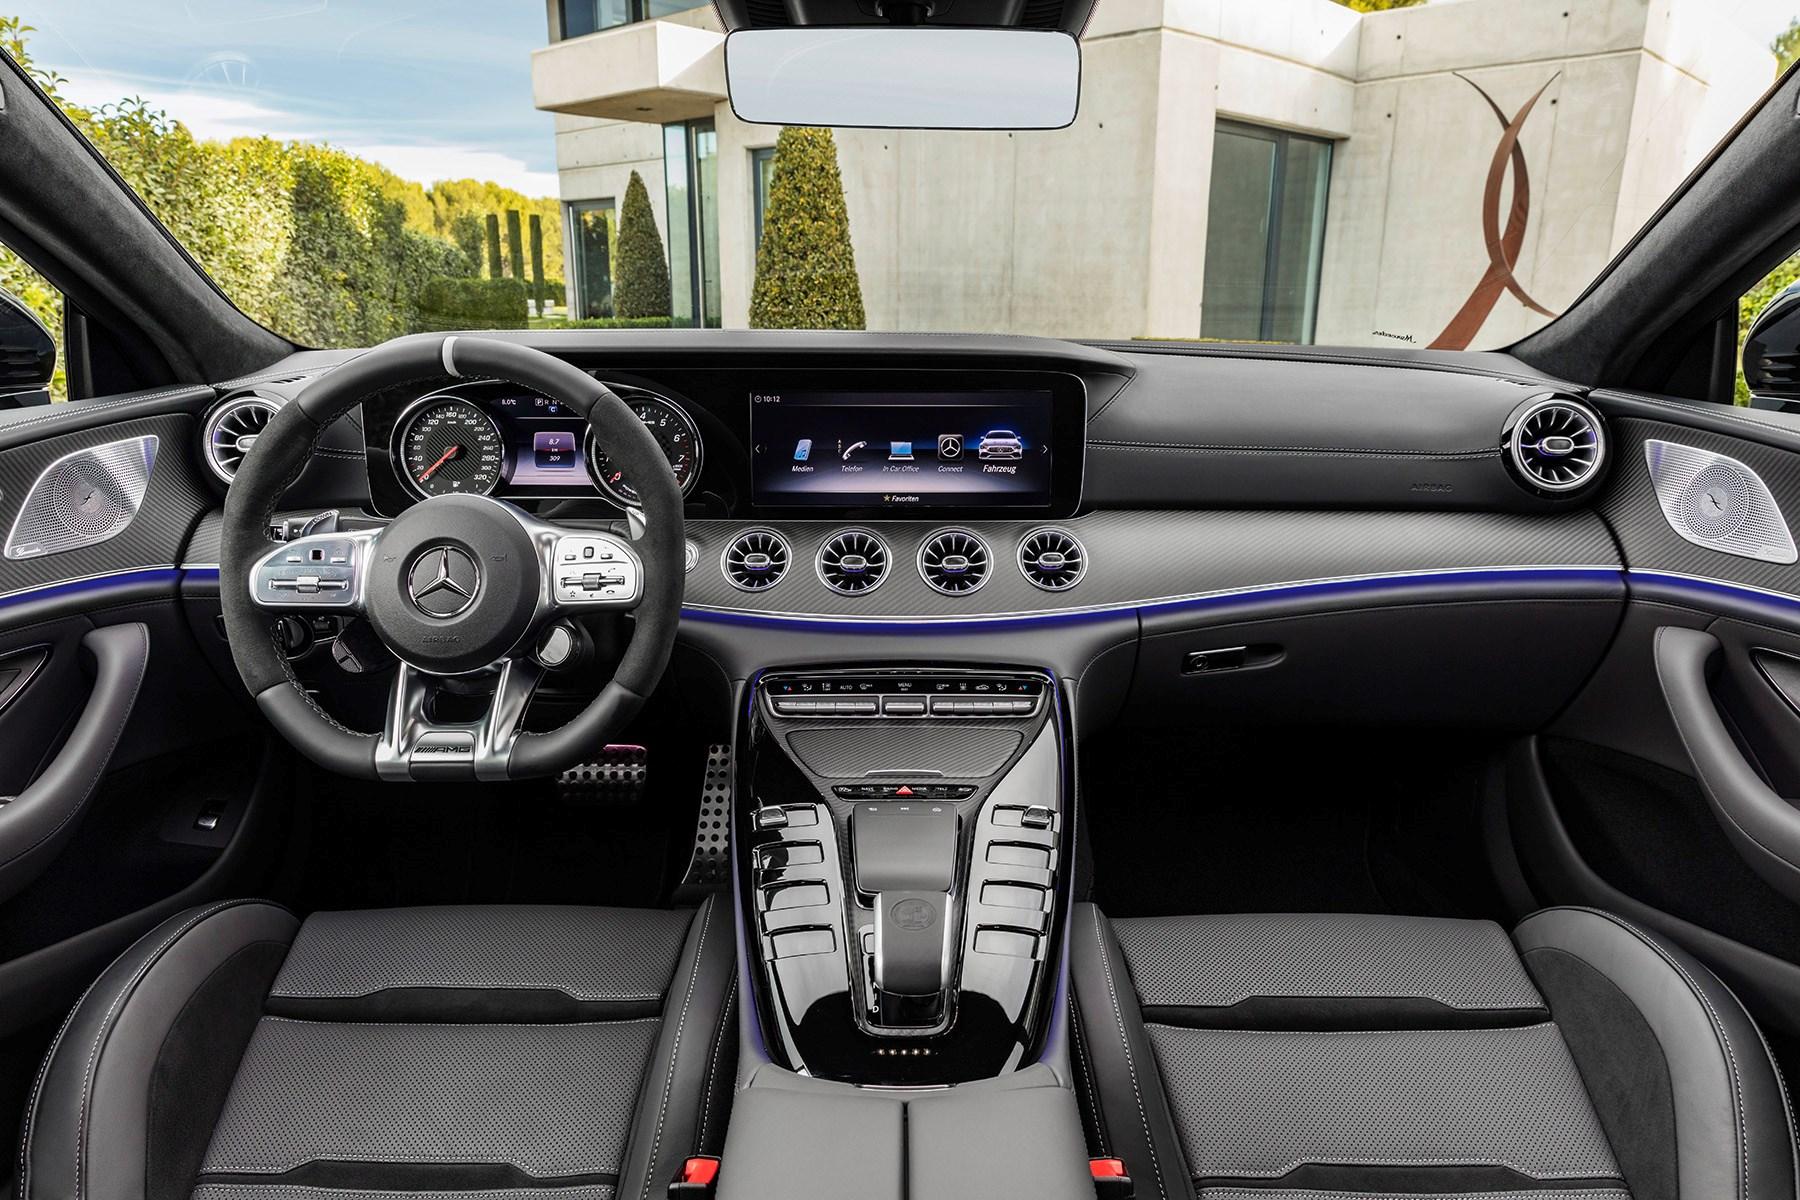 mercedes amg gt 4 door first ride impressions car magazine. Black Bedroom Furniture Sets. Home Design Ideas